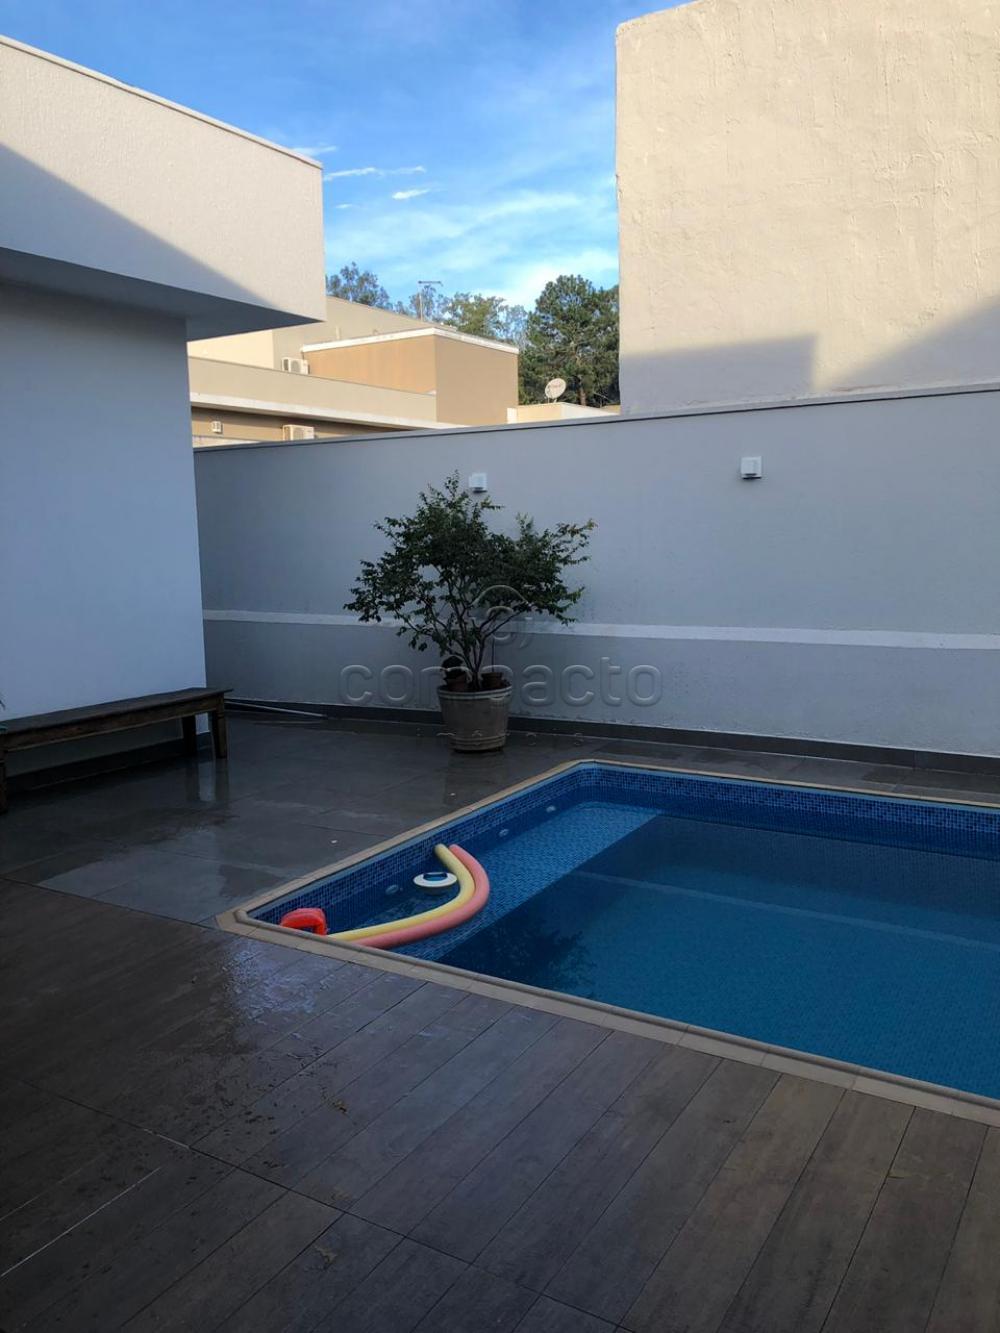 Comprar Casa / Condomínio em Bauru apenas R$ 850.000,00 - Foto 29